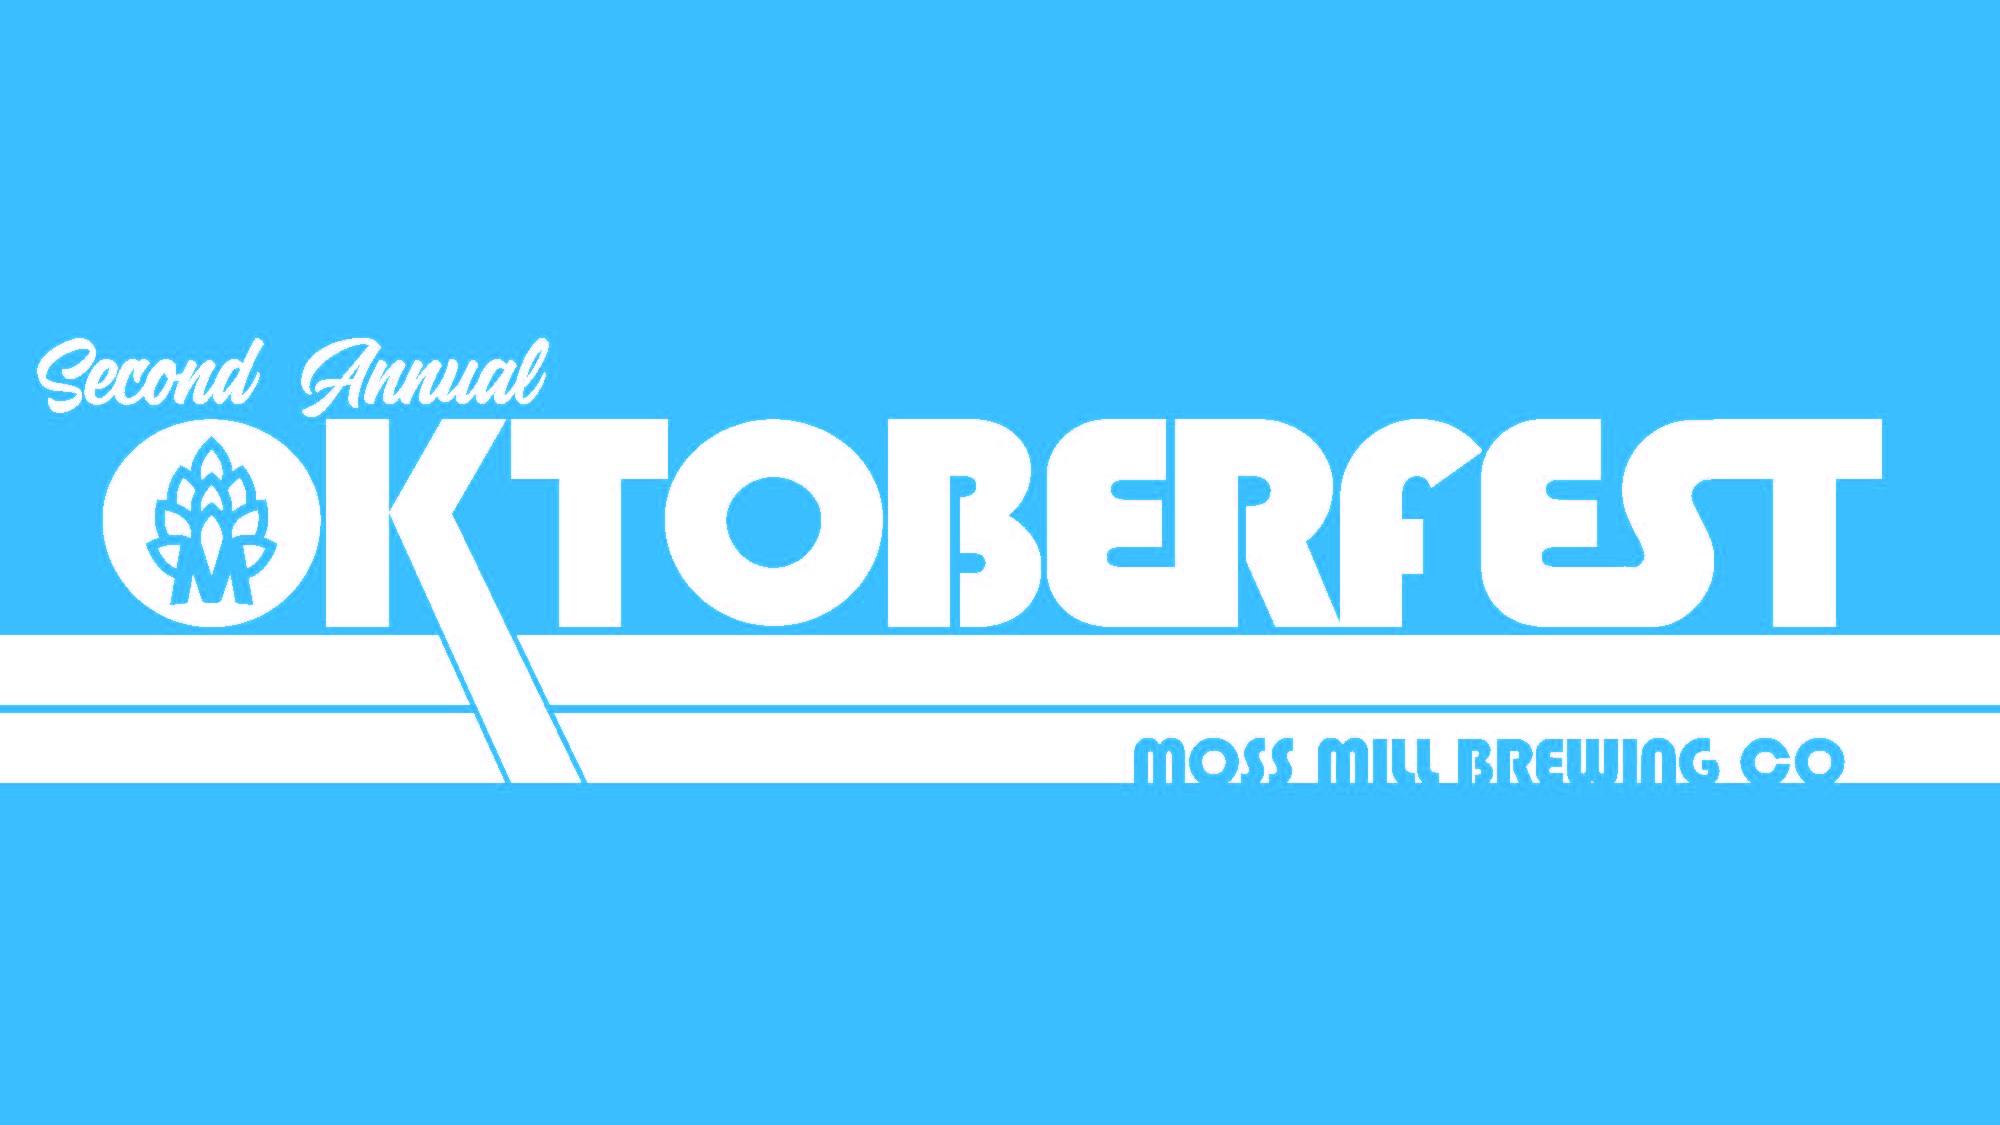 oktoberfest-logo-2019.jpg